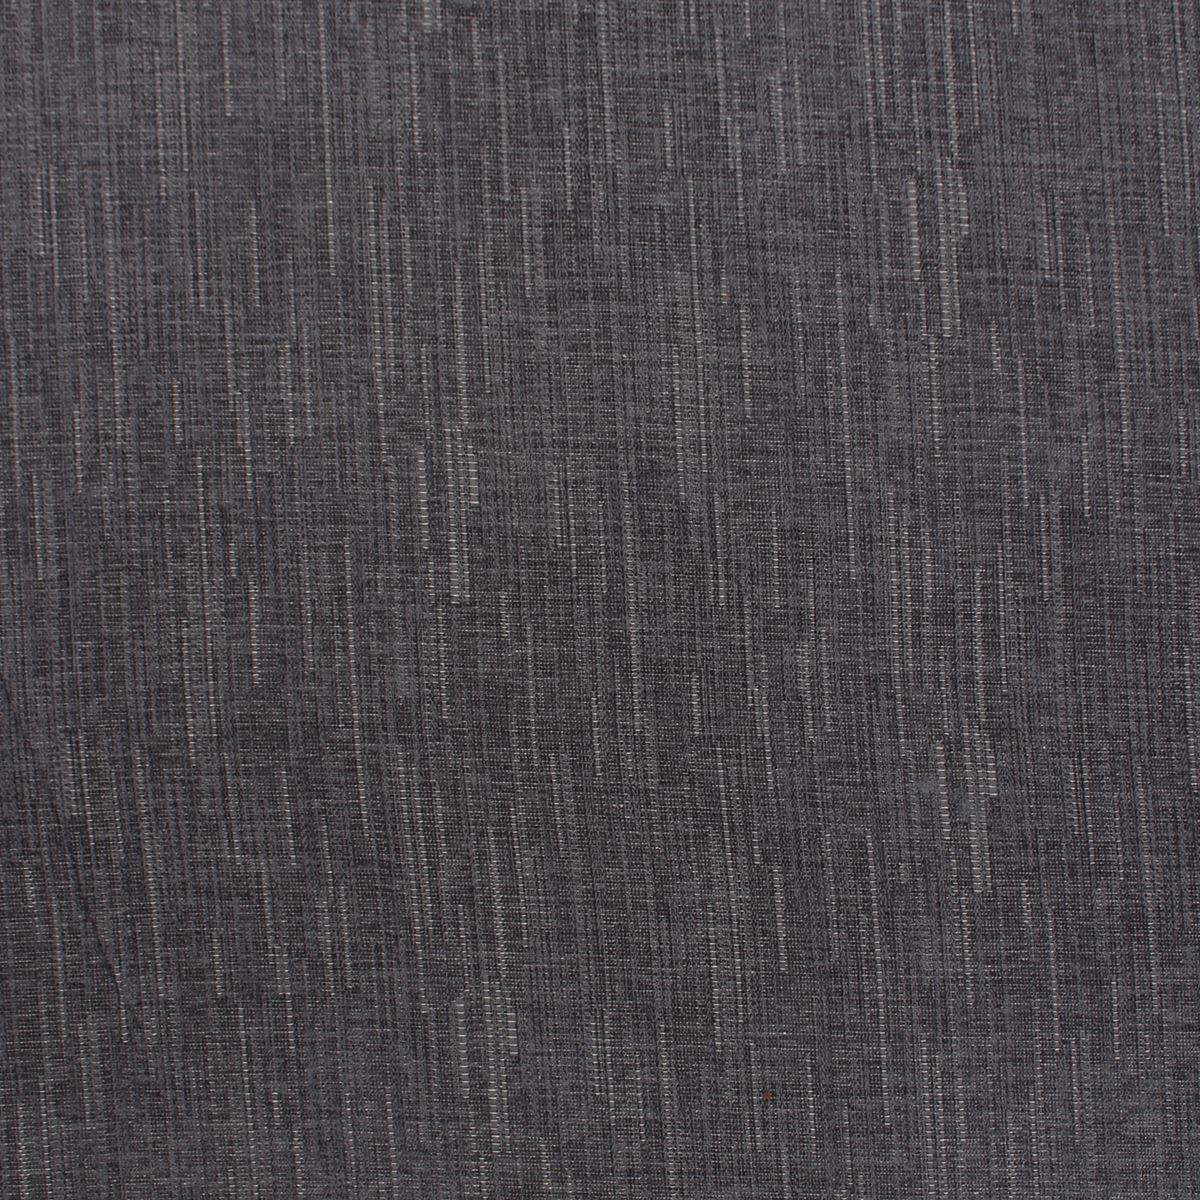 034-Chenille-034-Slubbed-Shabby-Worn-Look-Curtain-Cushion-Sofa-Upholstery-Fabric thumbnail 27